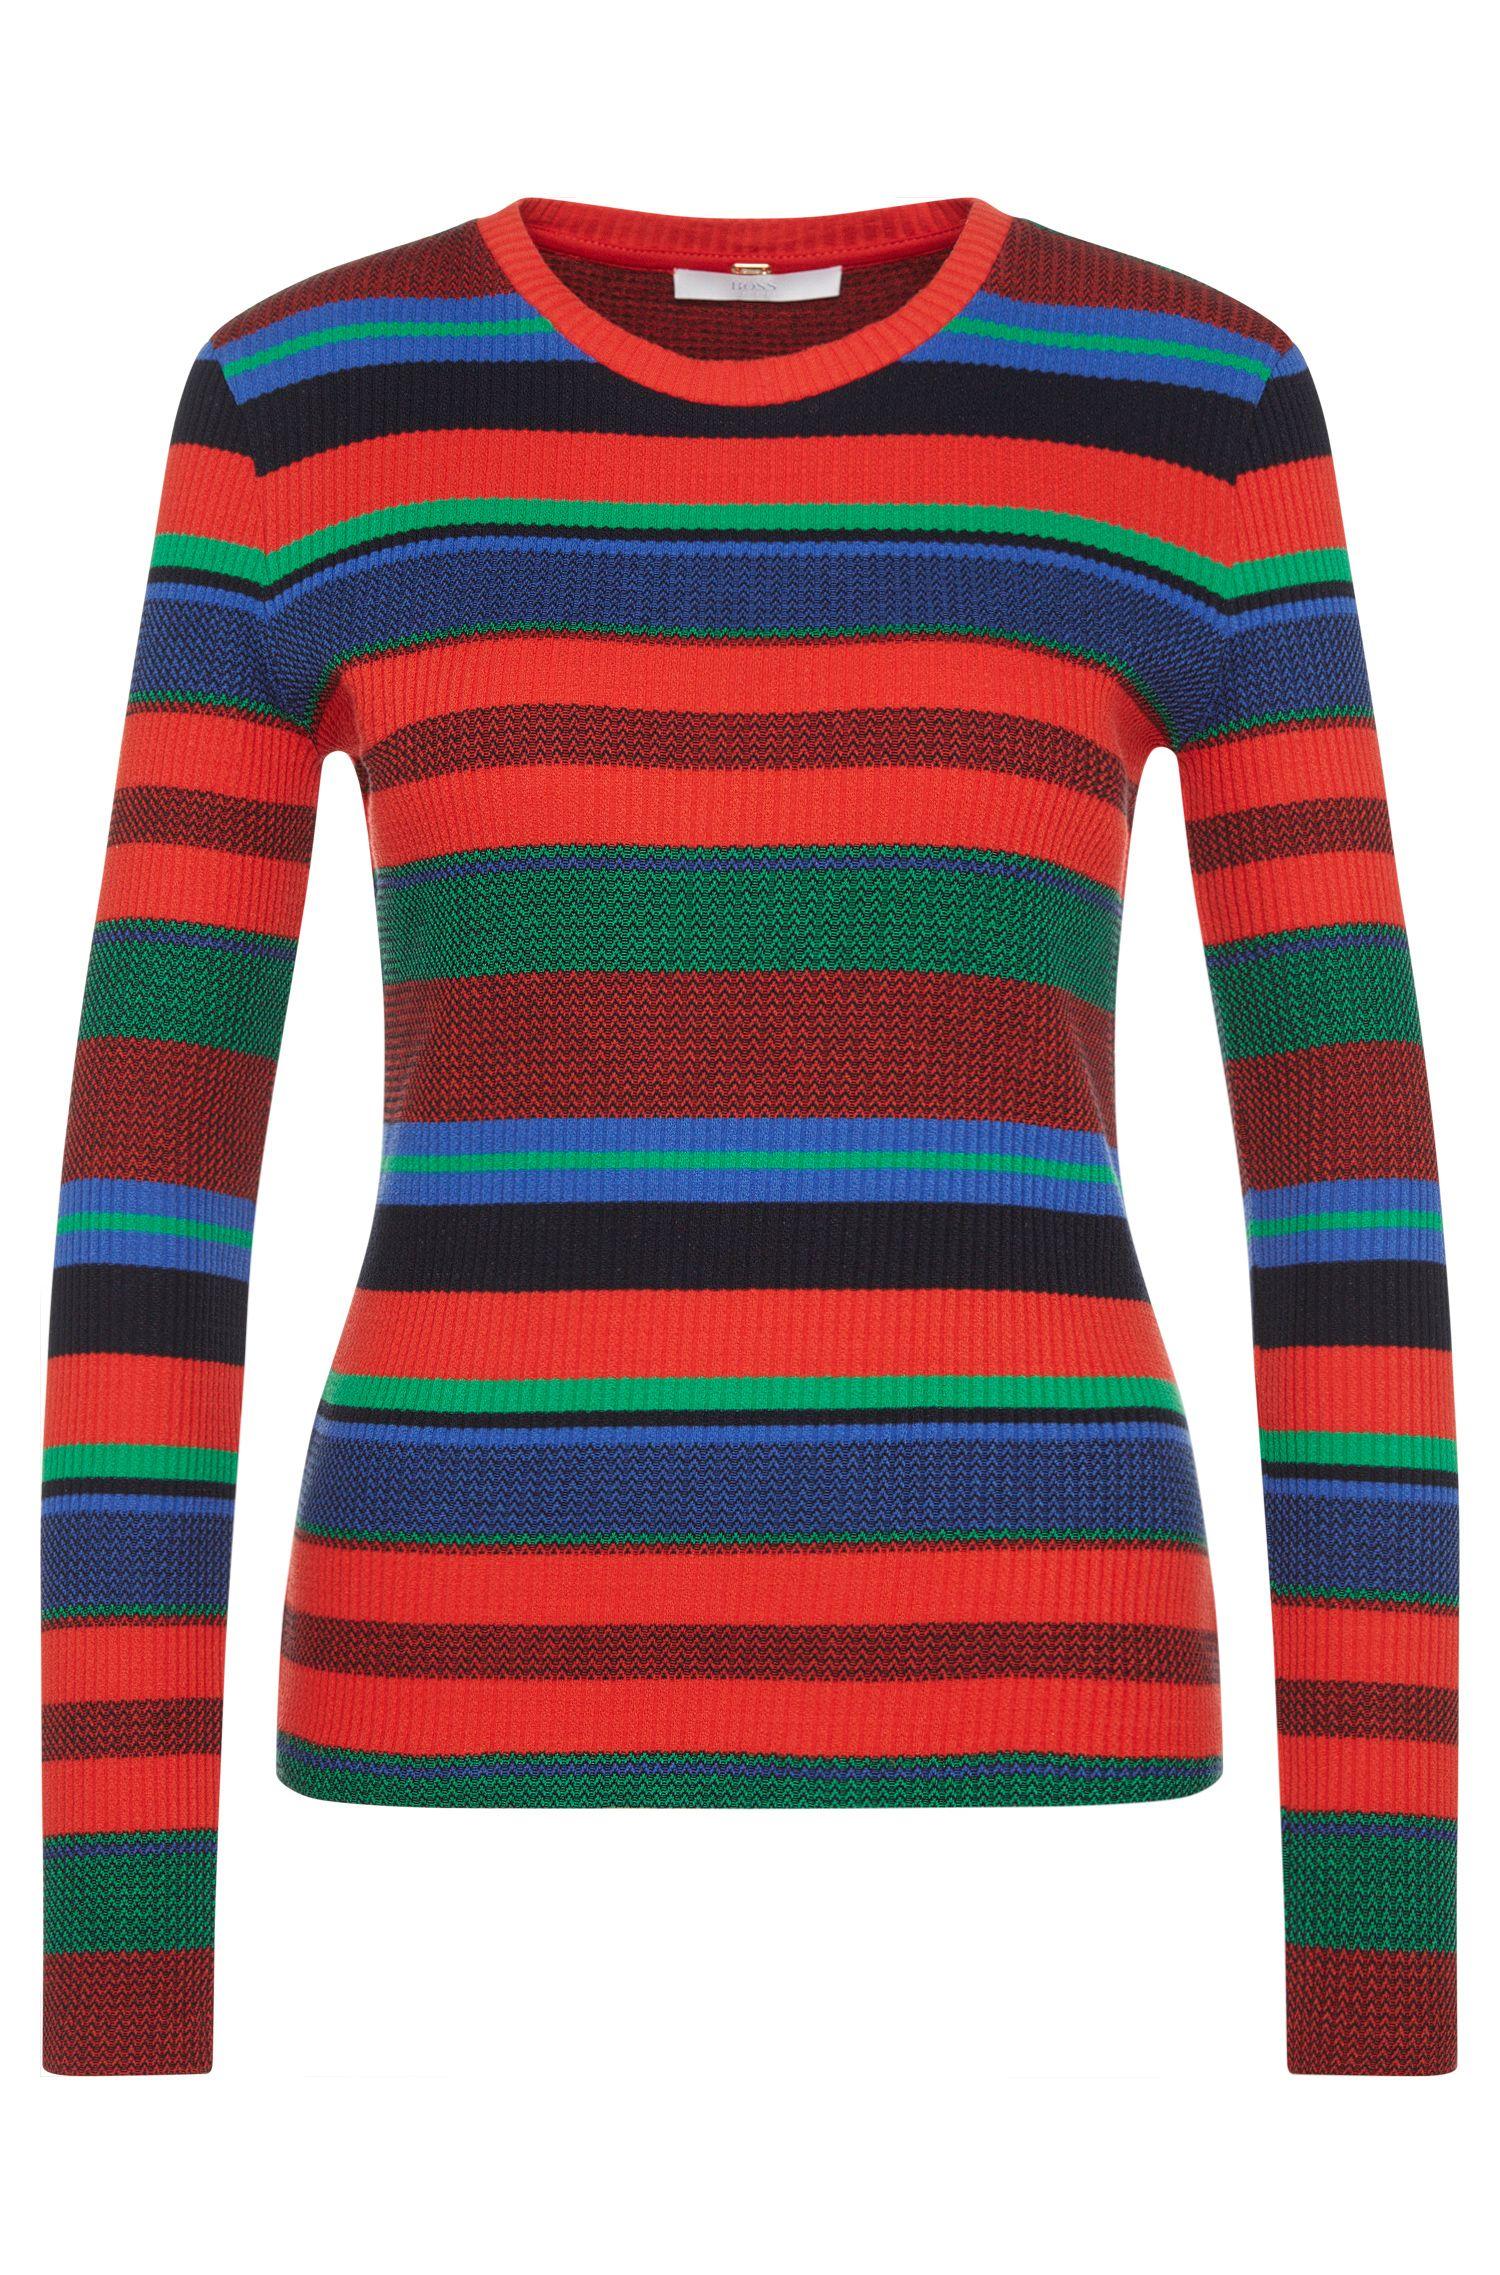 'Eriba' | Stretch Cotton Ribbed Striped Sweater